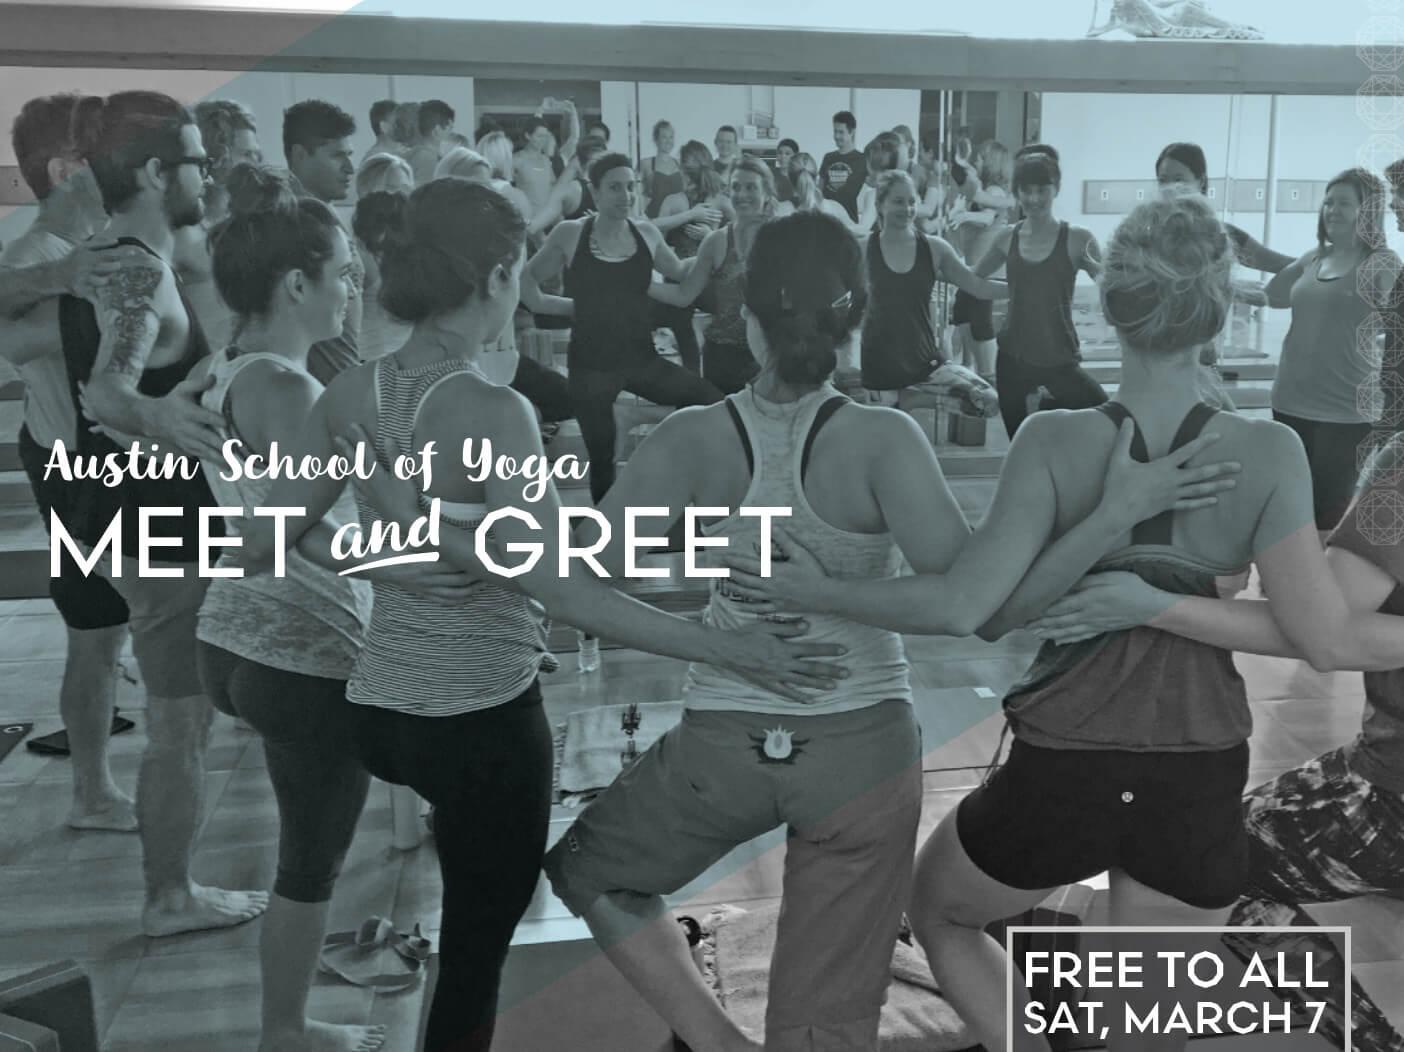 Austin School of Yoga Meet and Greet